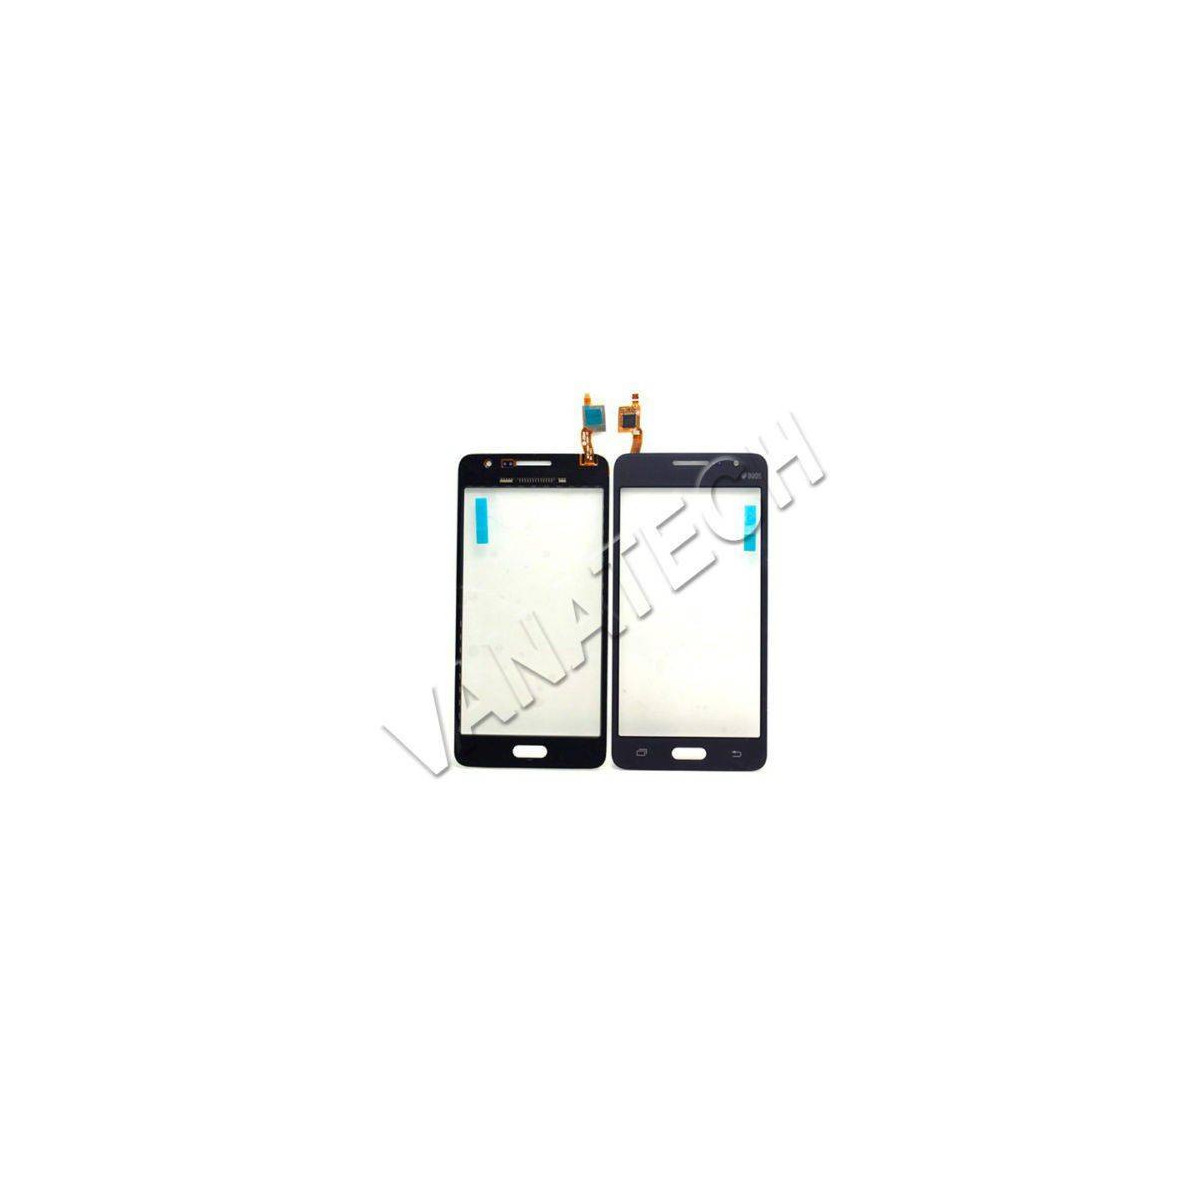 BATTERIA RICAMBIO PER APPLE IPHONE 6 6G 1810mAh 3,82V